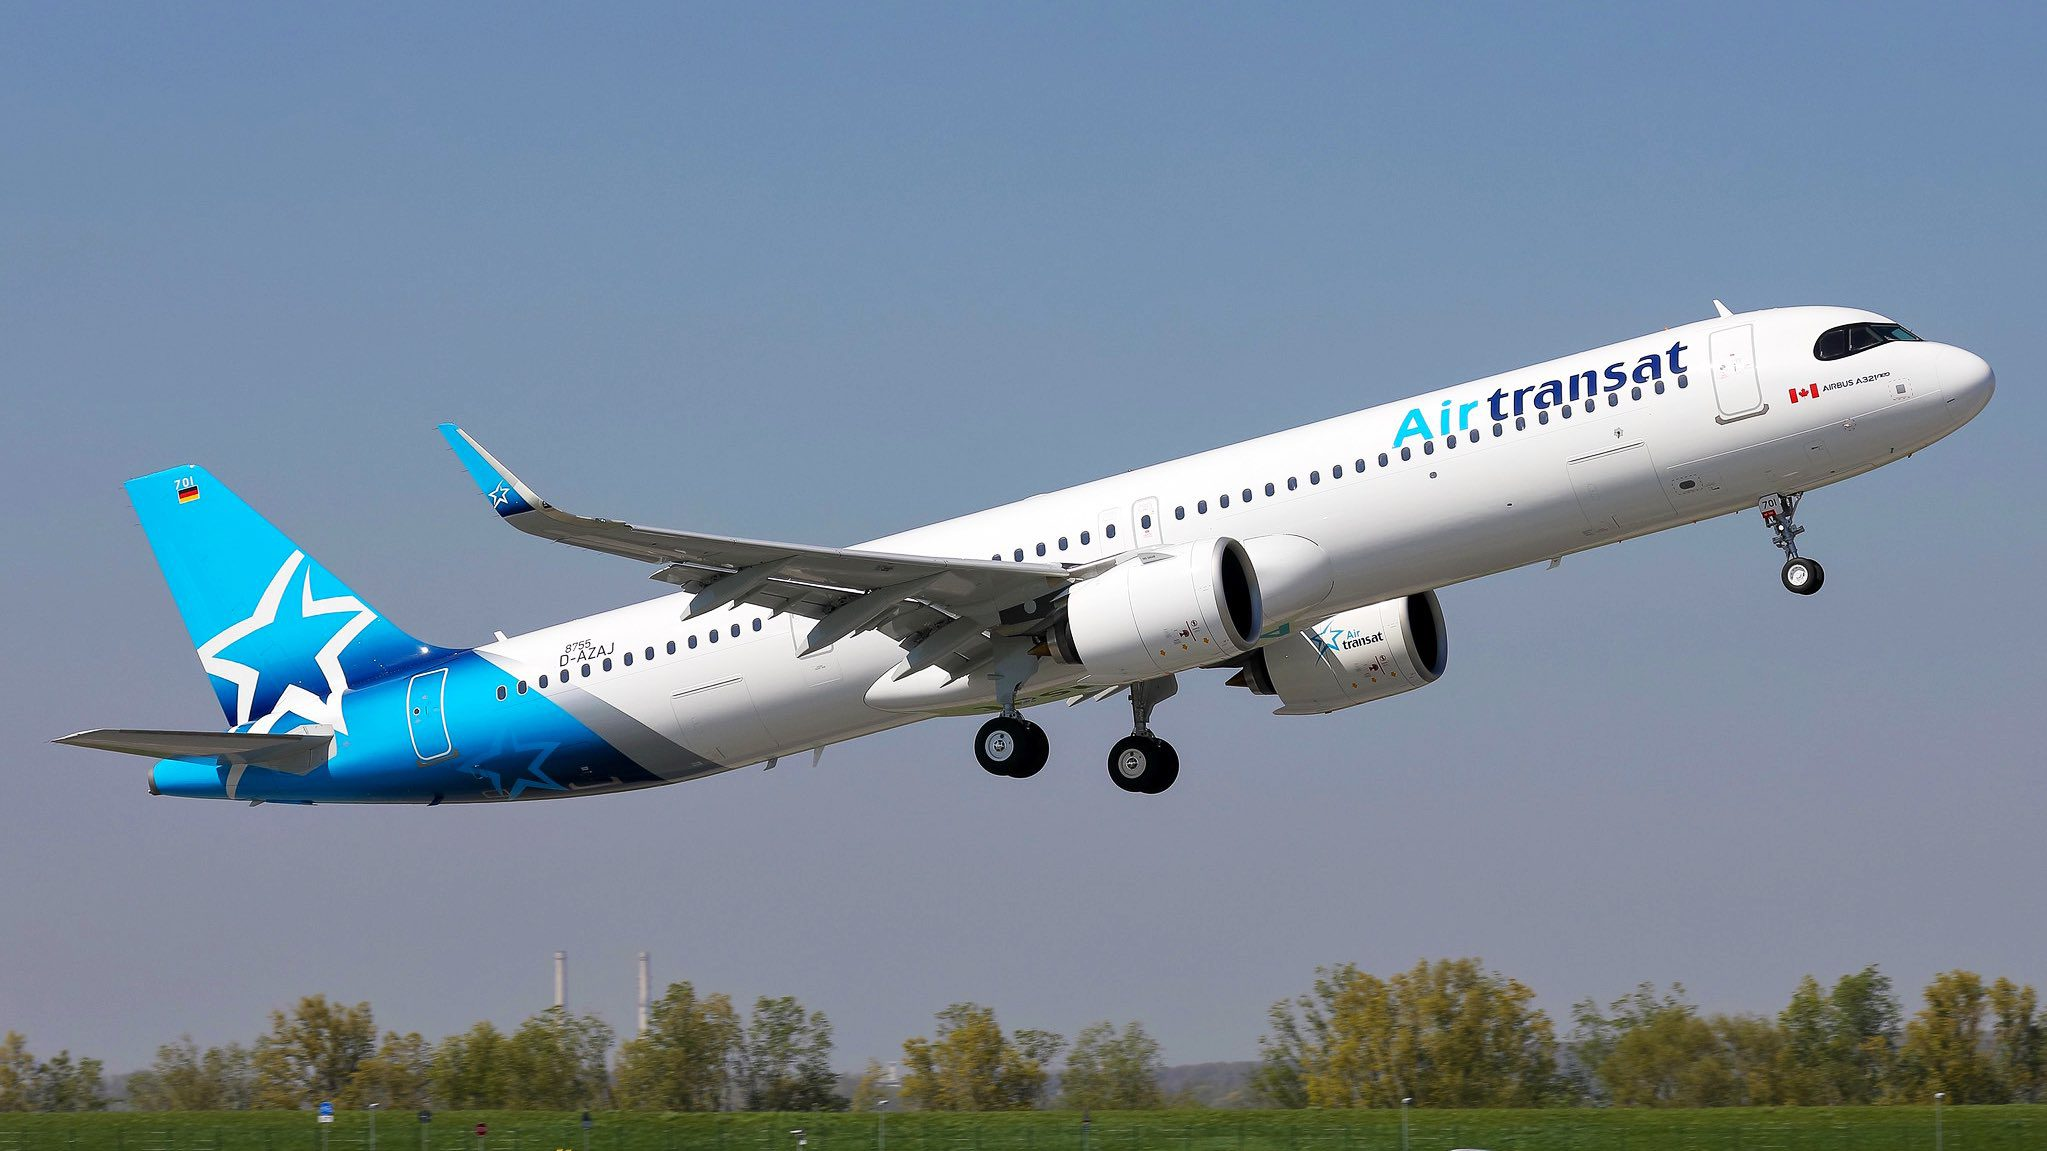 Air Transat Break A321LR Distance Record!